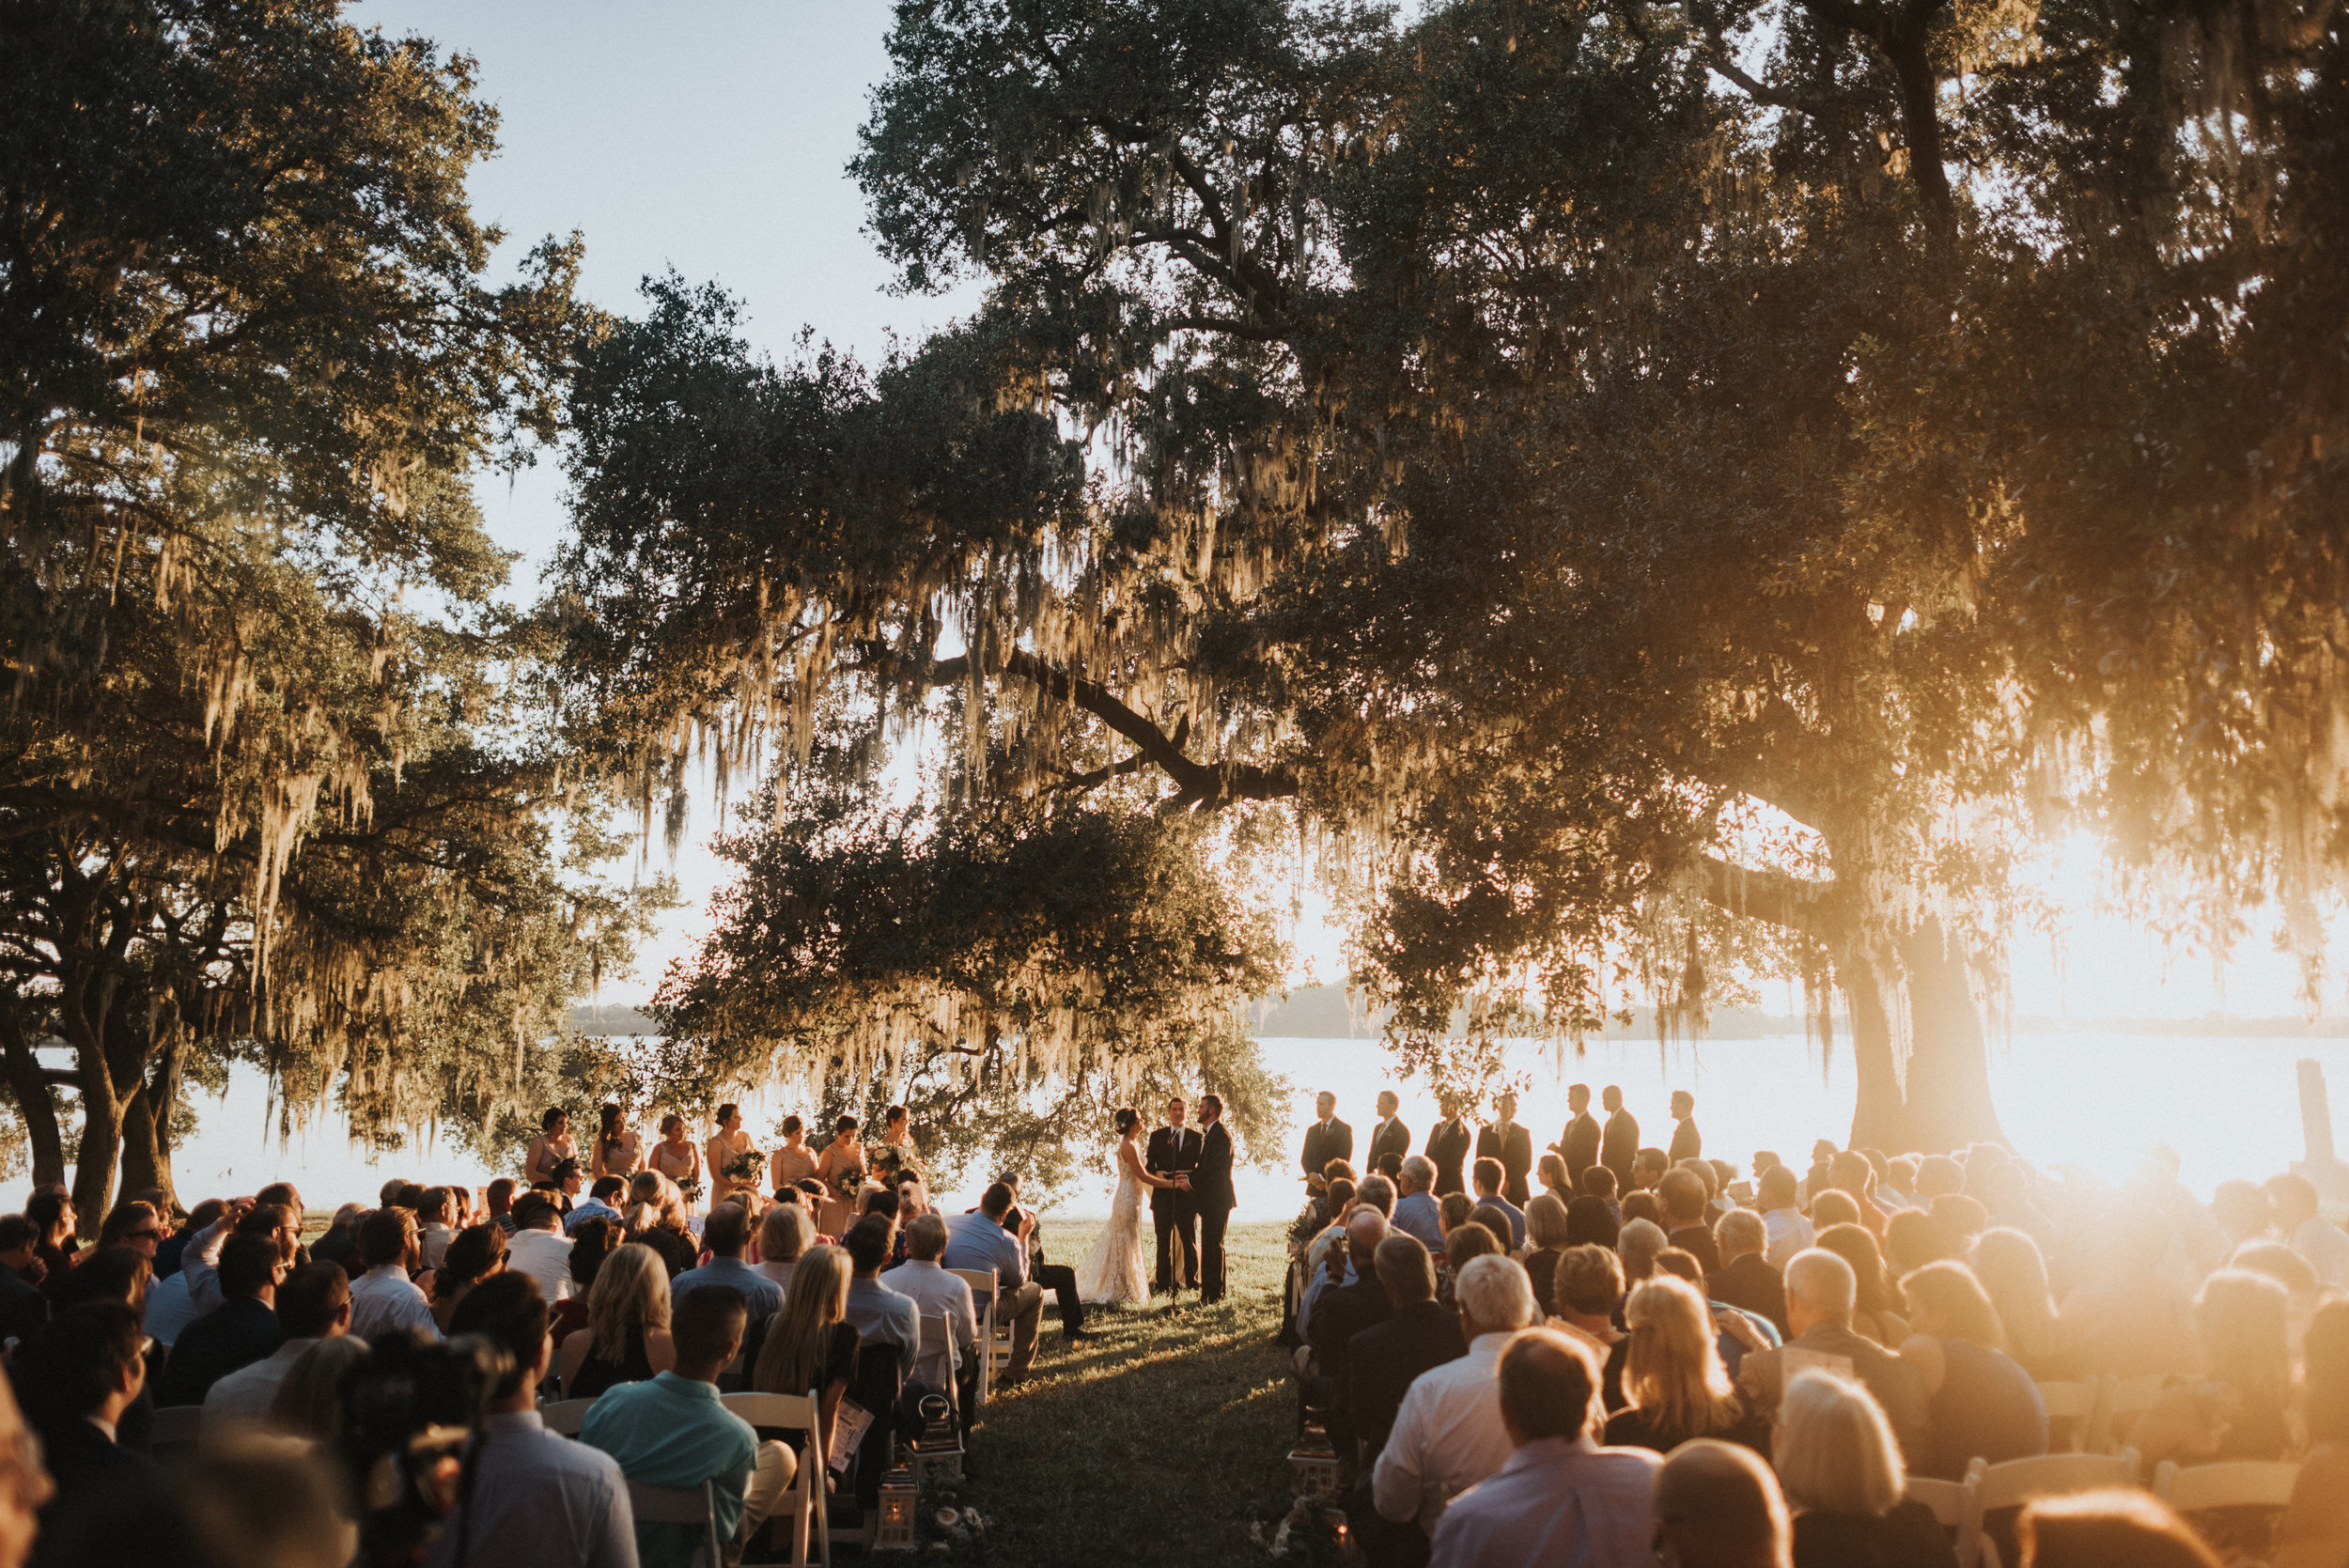 Southern Fete, Southern Wedding, Outside Wedding, Sunset Ceremony